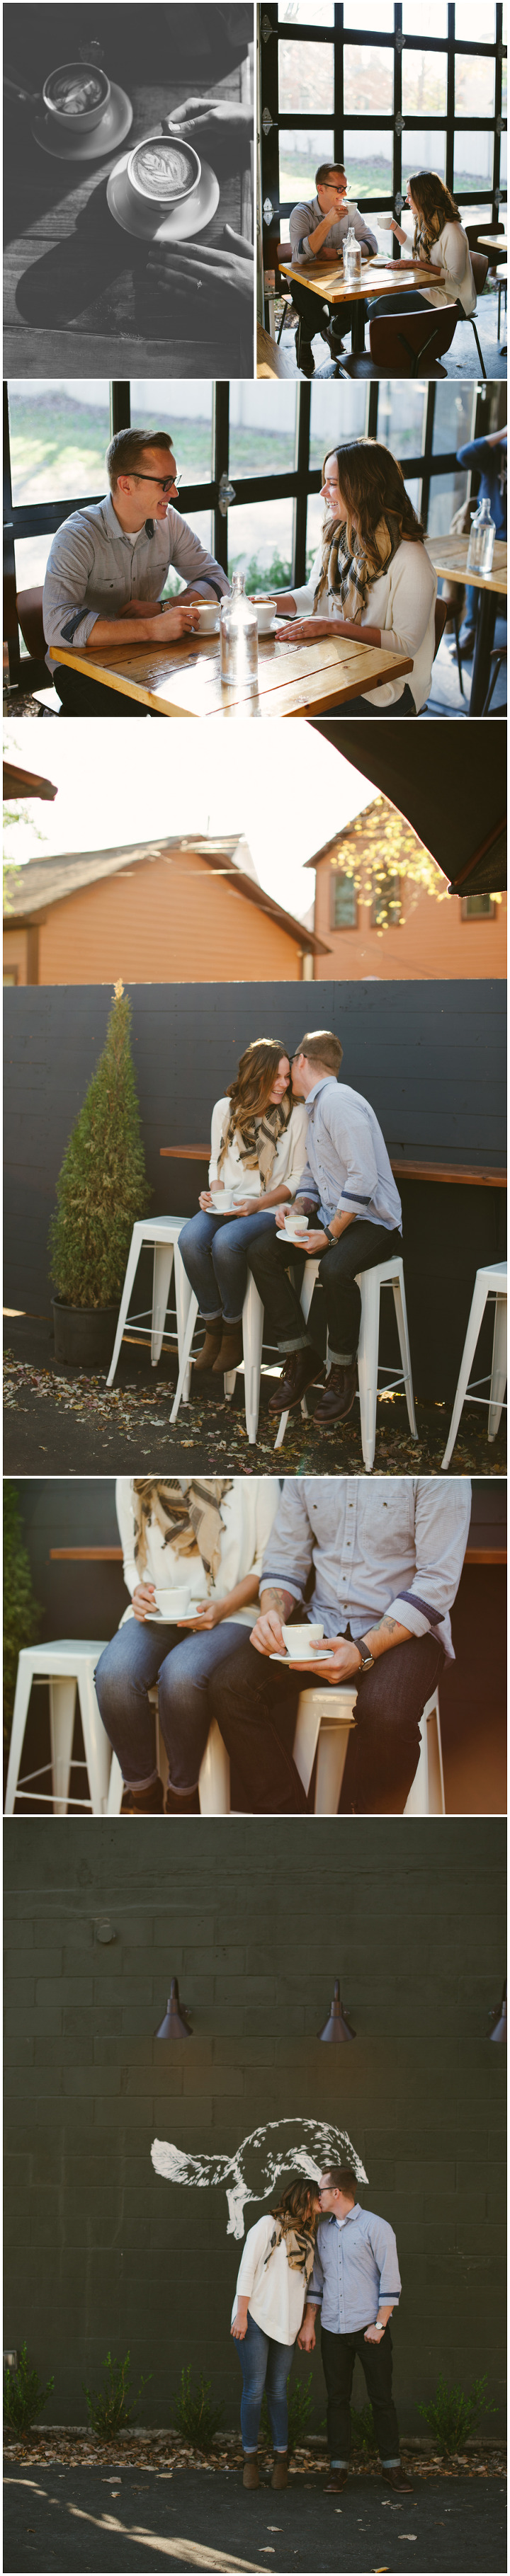 Blog Collage-Josh+Val2